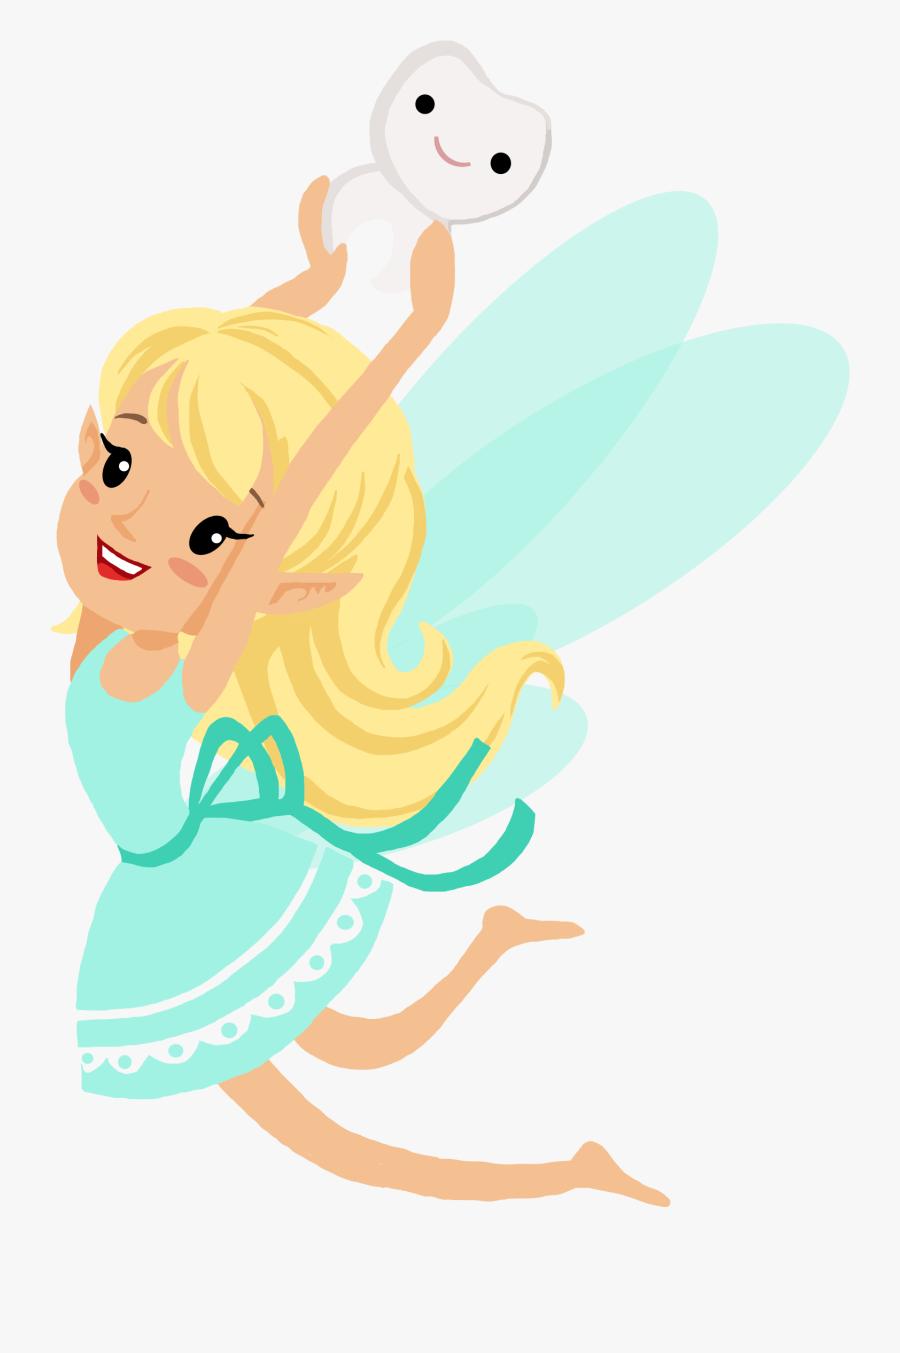 #qualitywork #detailed #sticker #fairy #cartoon #kids - Illustration, Transparent Clipart